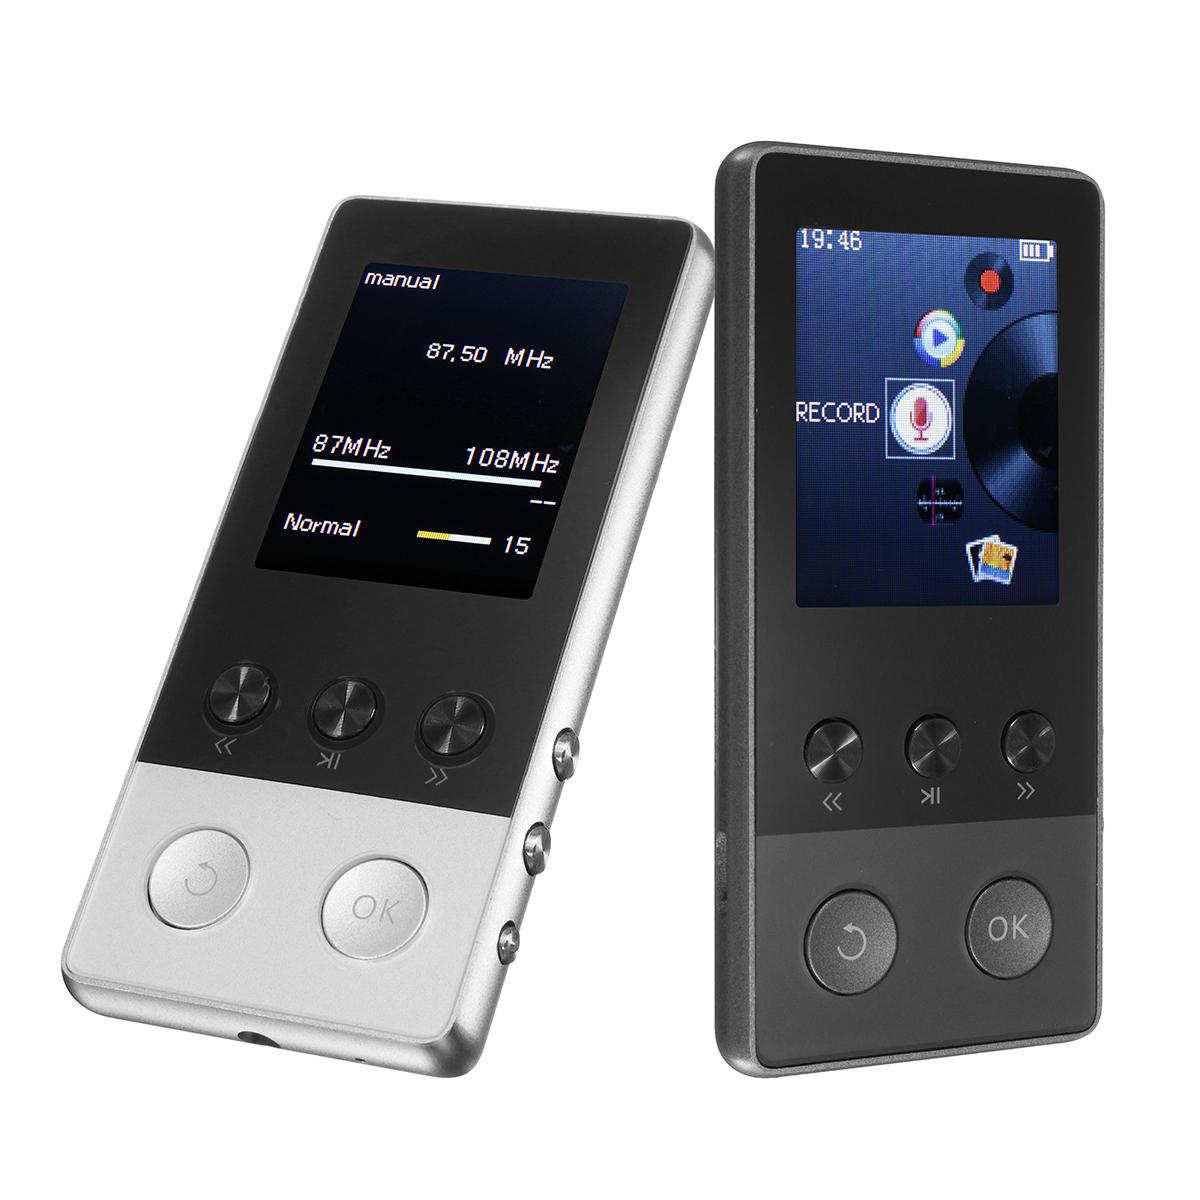 a5 plus digital player manual